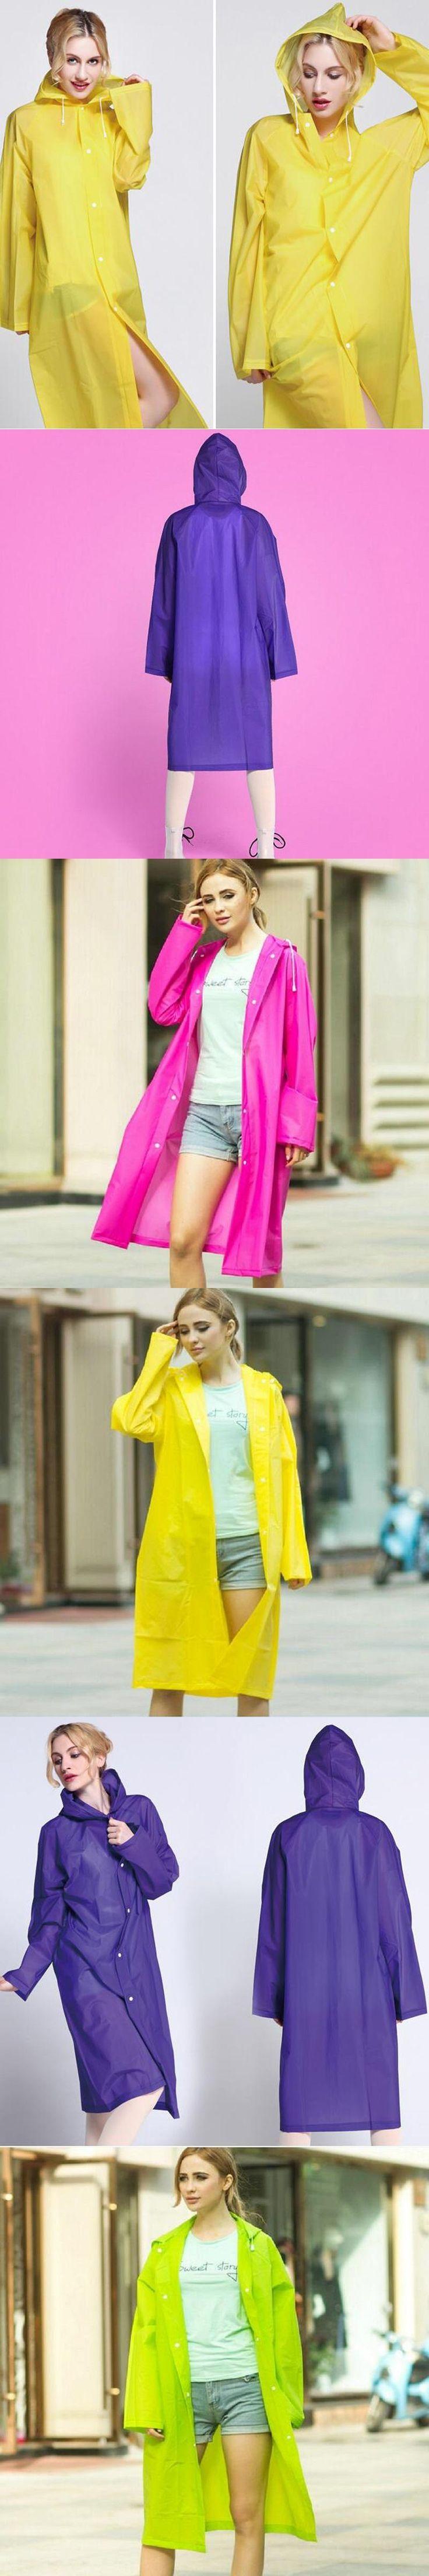 WINSTBROK Rain Jacket Women/Men 2017 Fashion Rain Coat Impermeable Environment Designer Rain Jackets Eva Ladies Long Raincoat